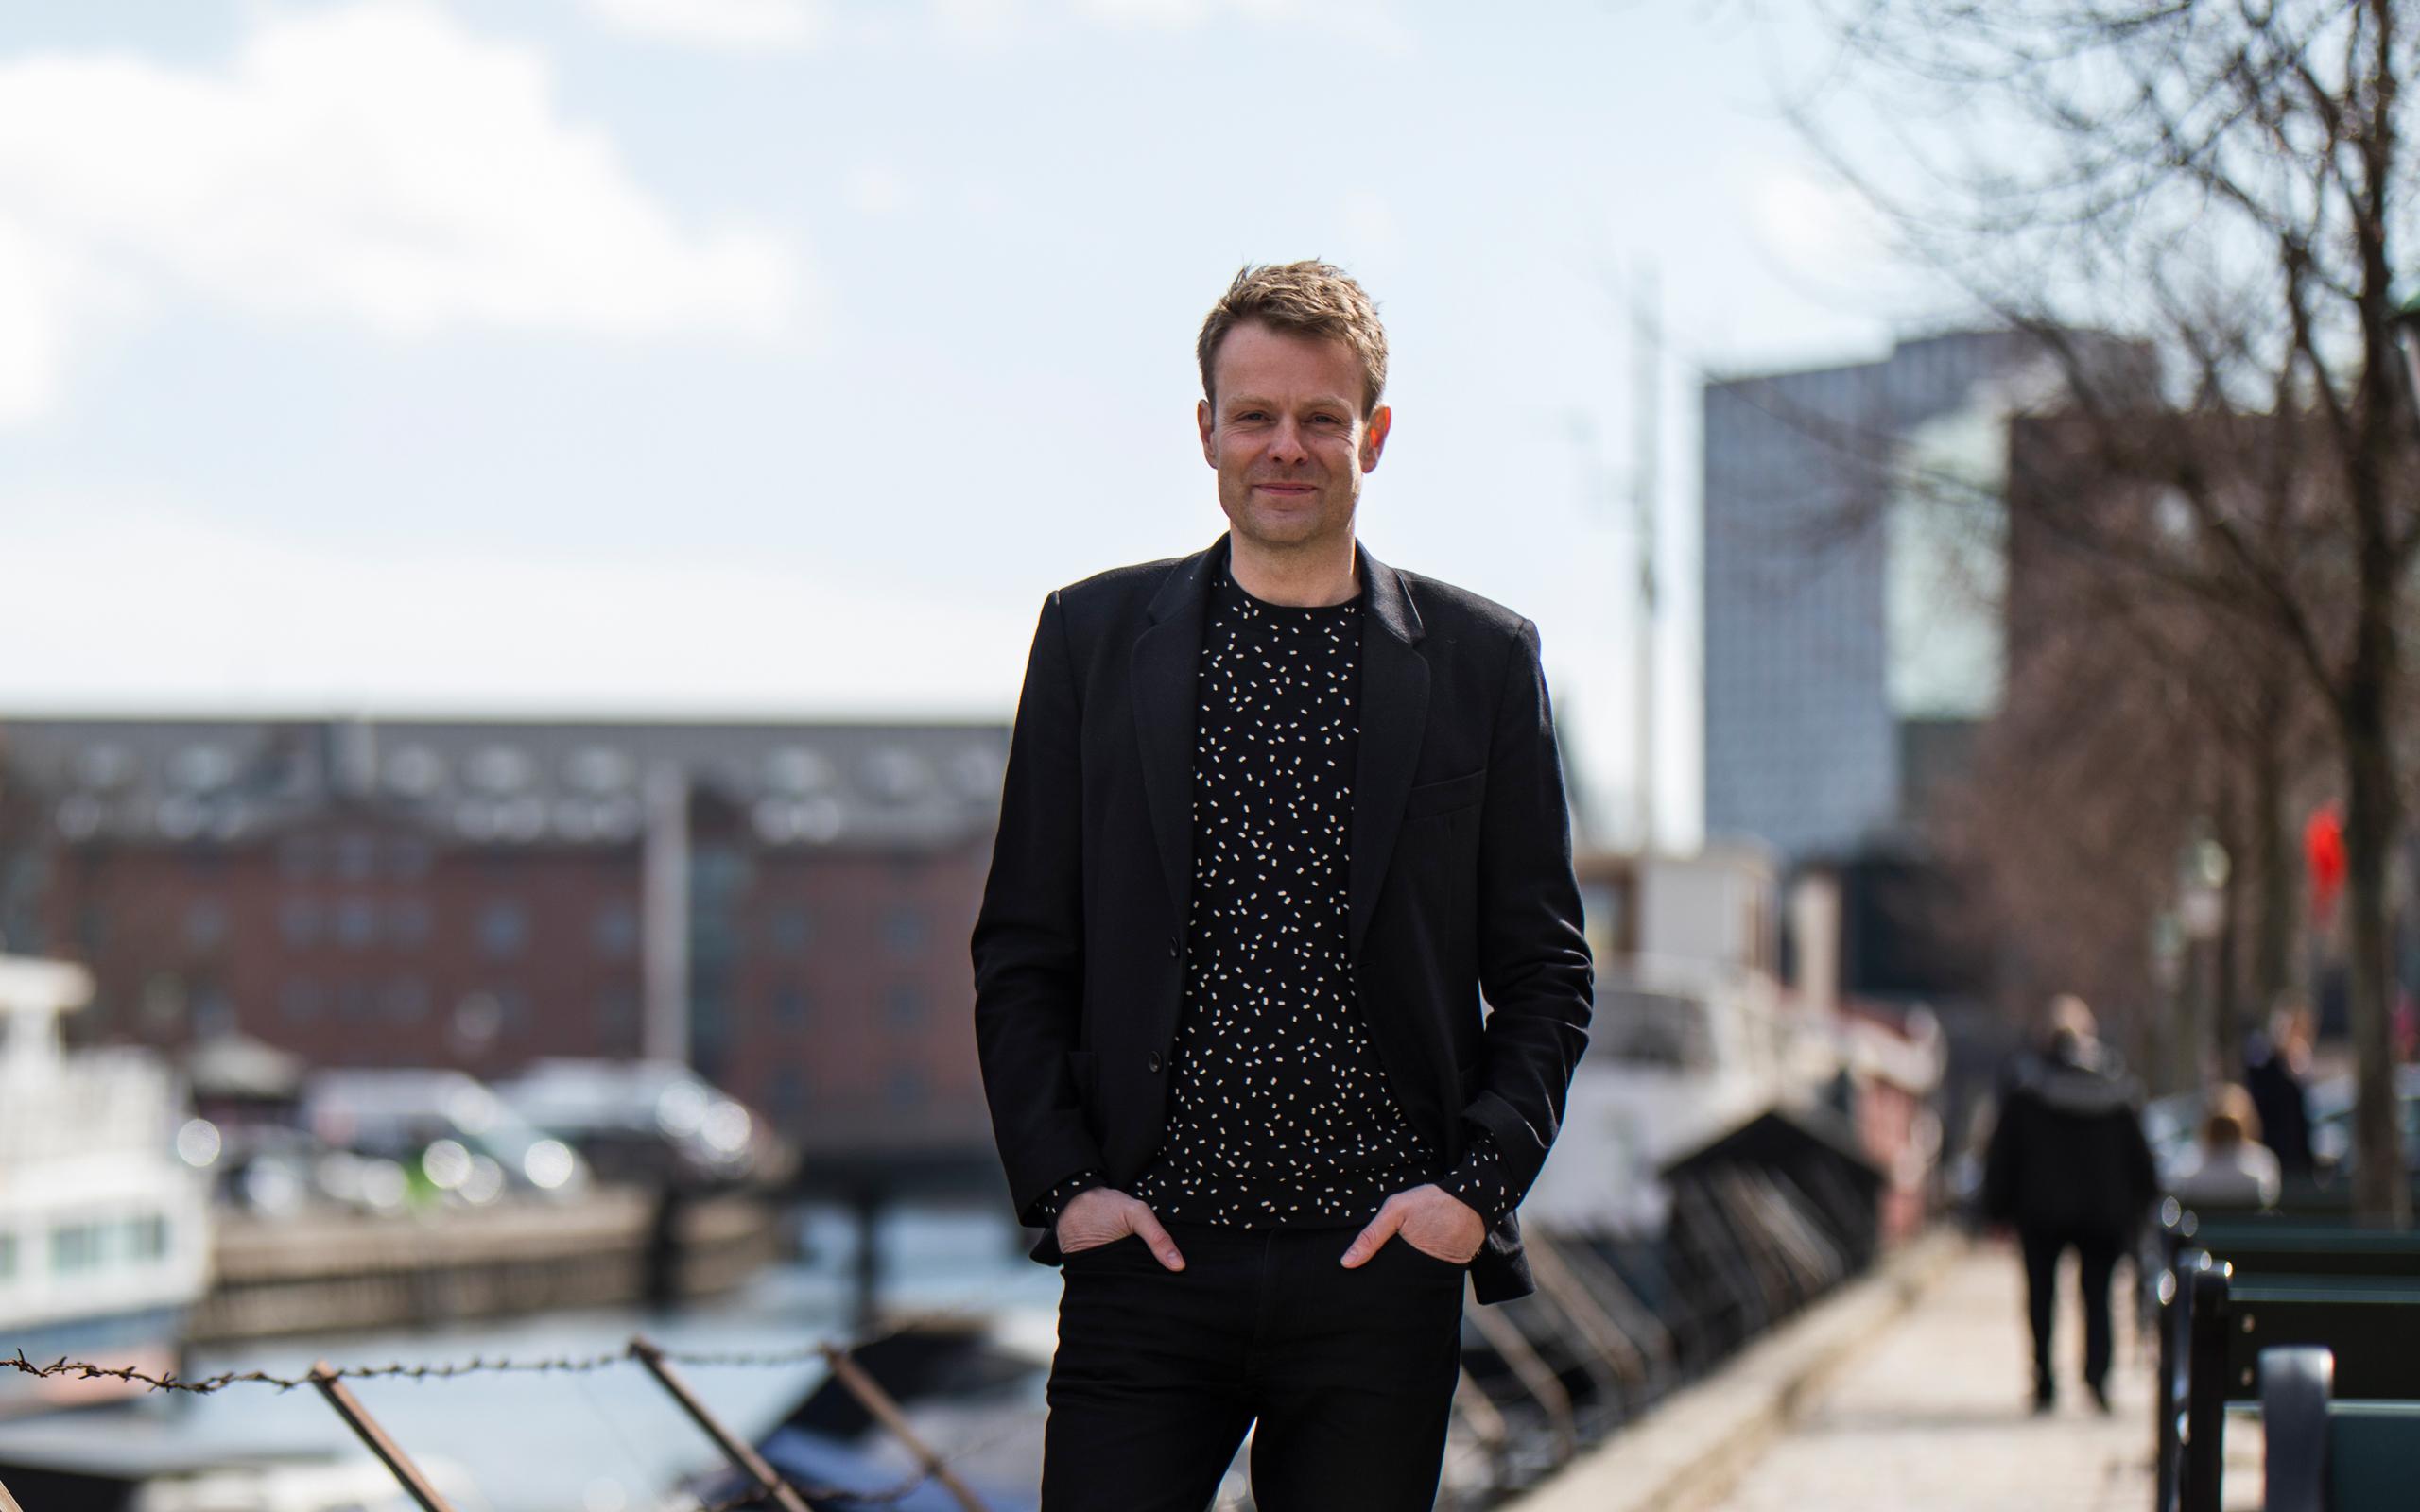 Kultur- og fritidsborgmester Niko Grünfeld